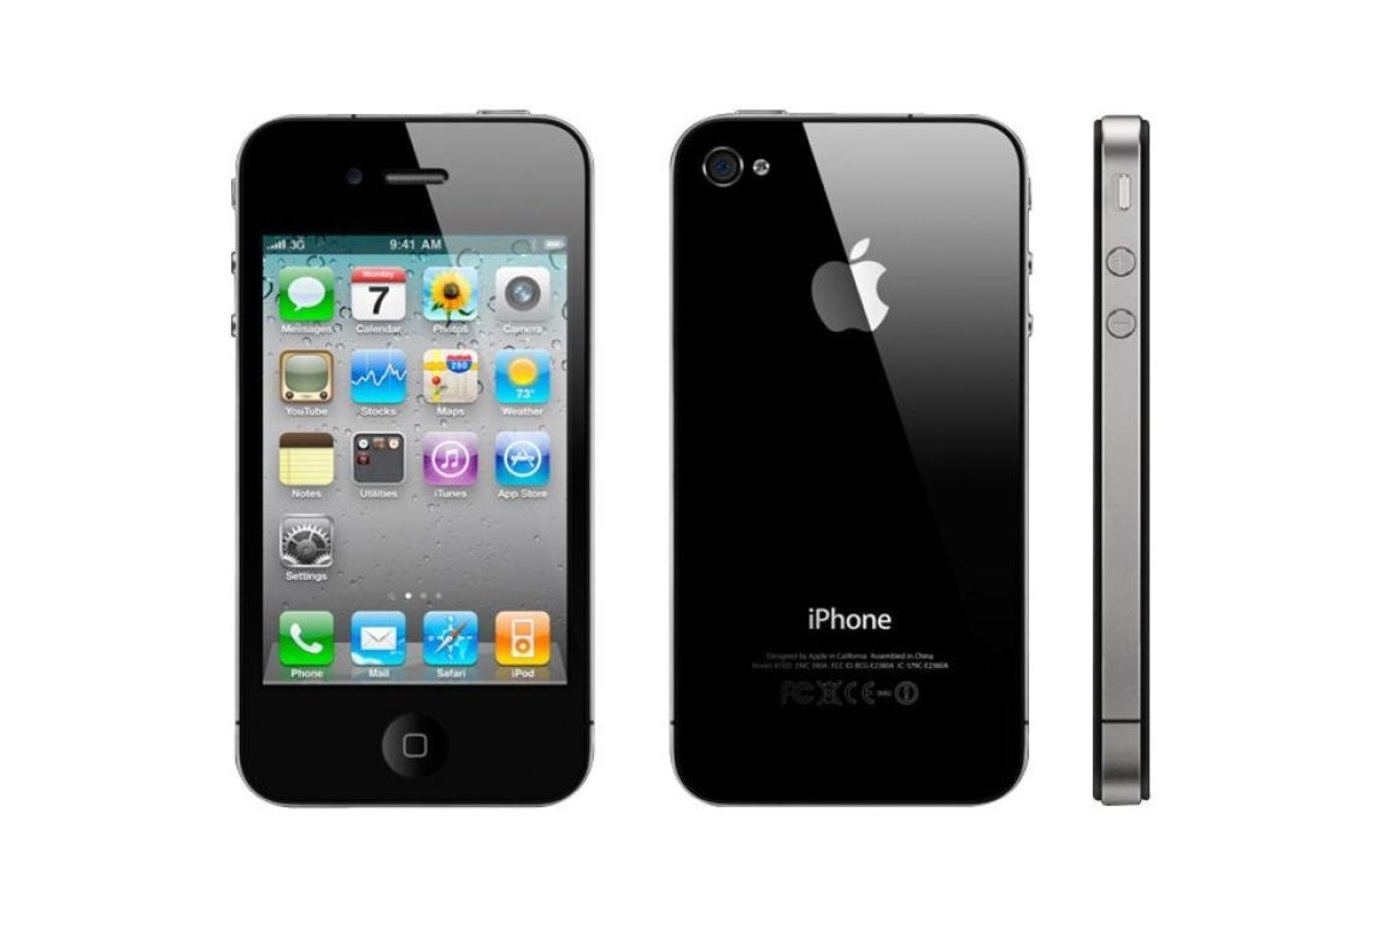 un rein contre un iPhone 4